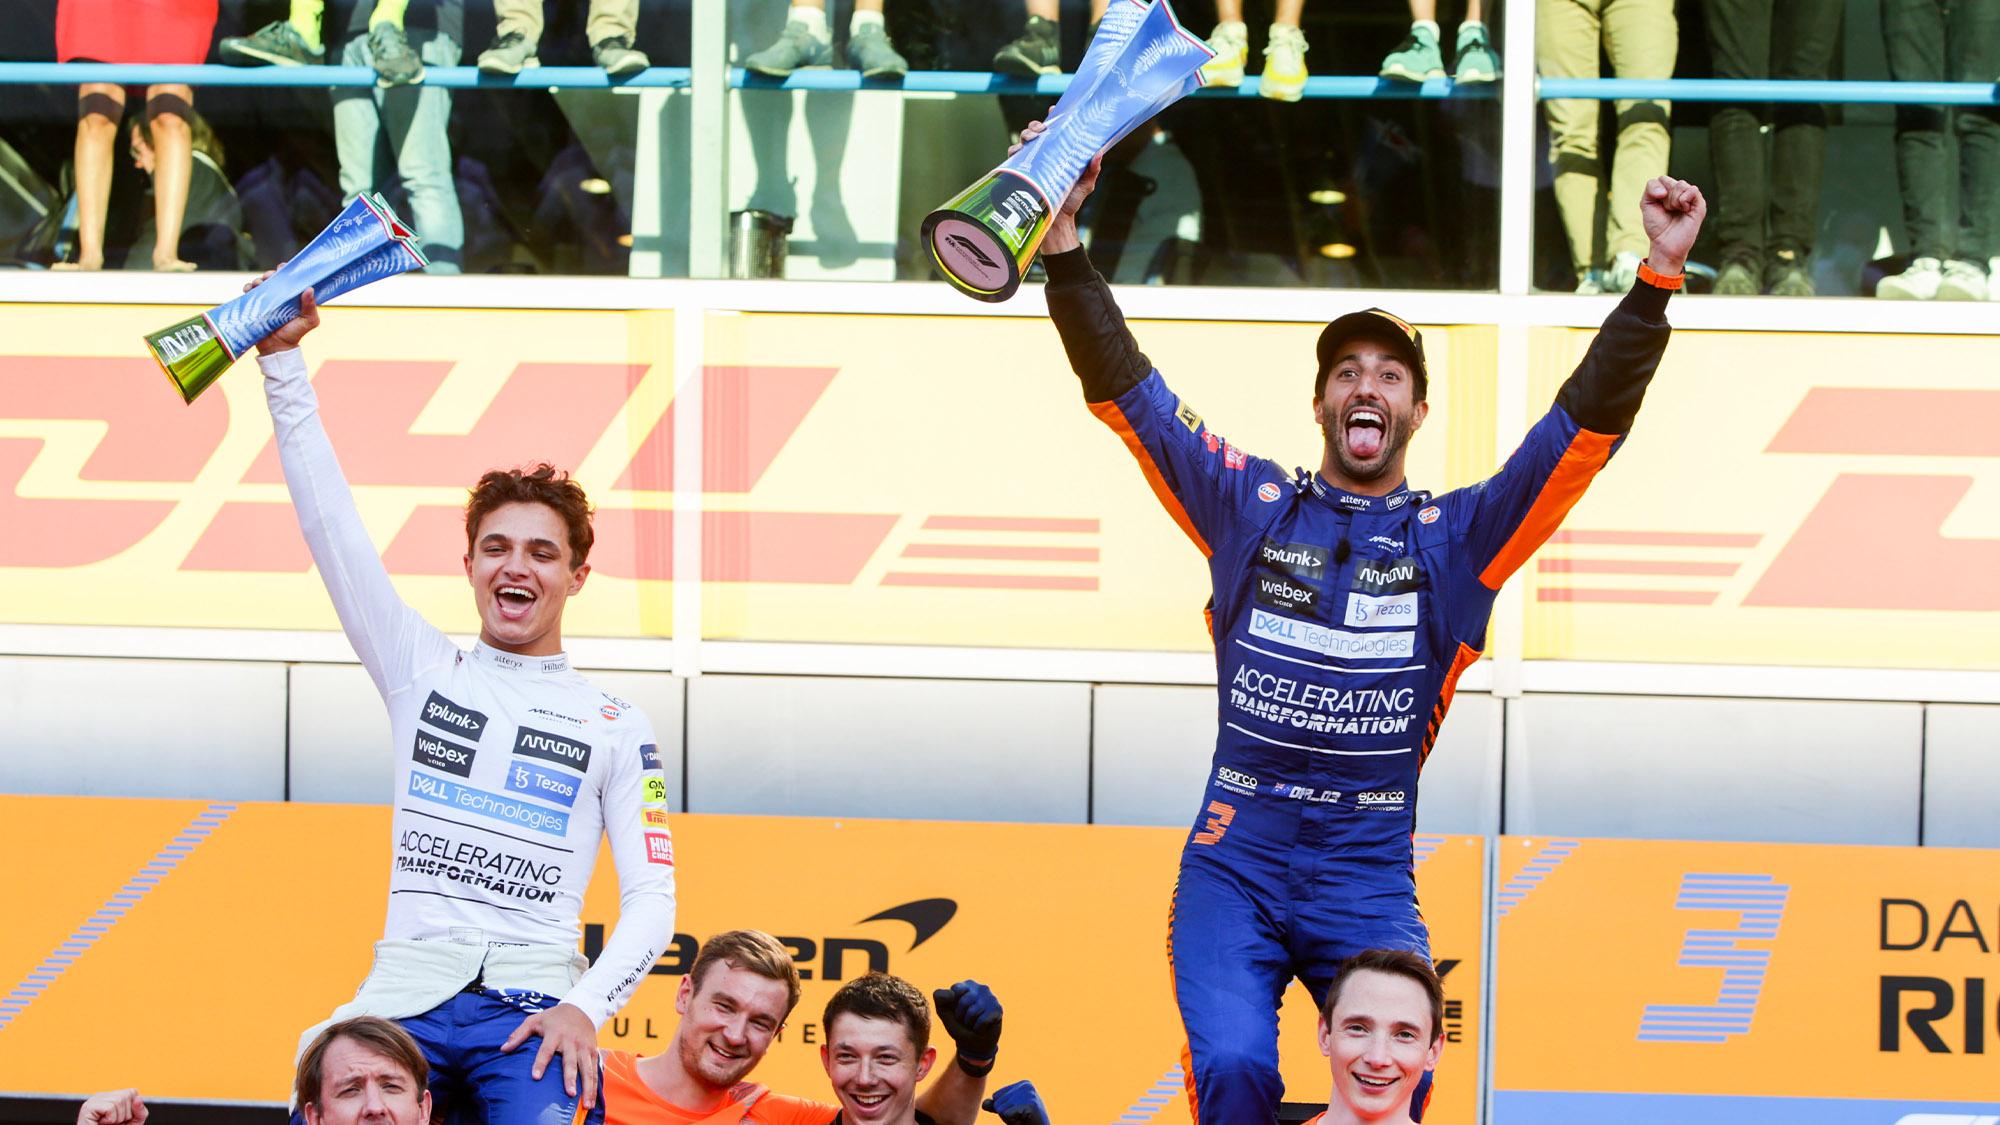 Lando Norris and Daniel Ricciardo celebrate with trophies at Monza